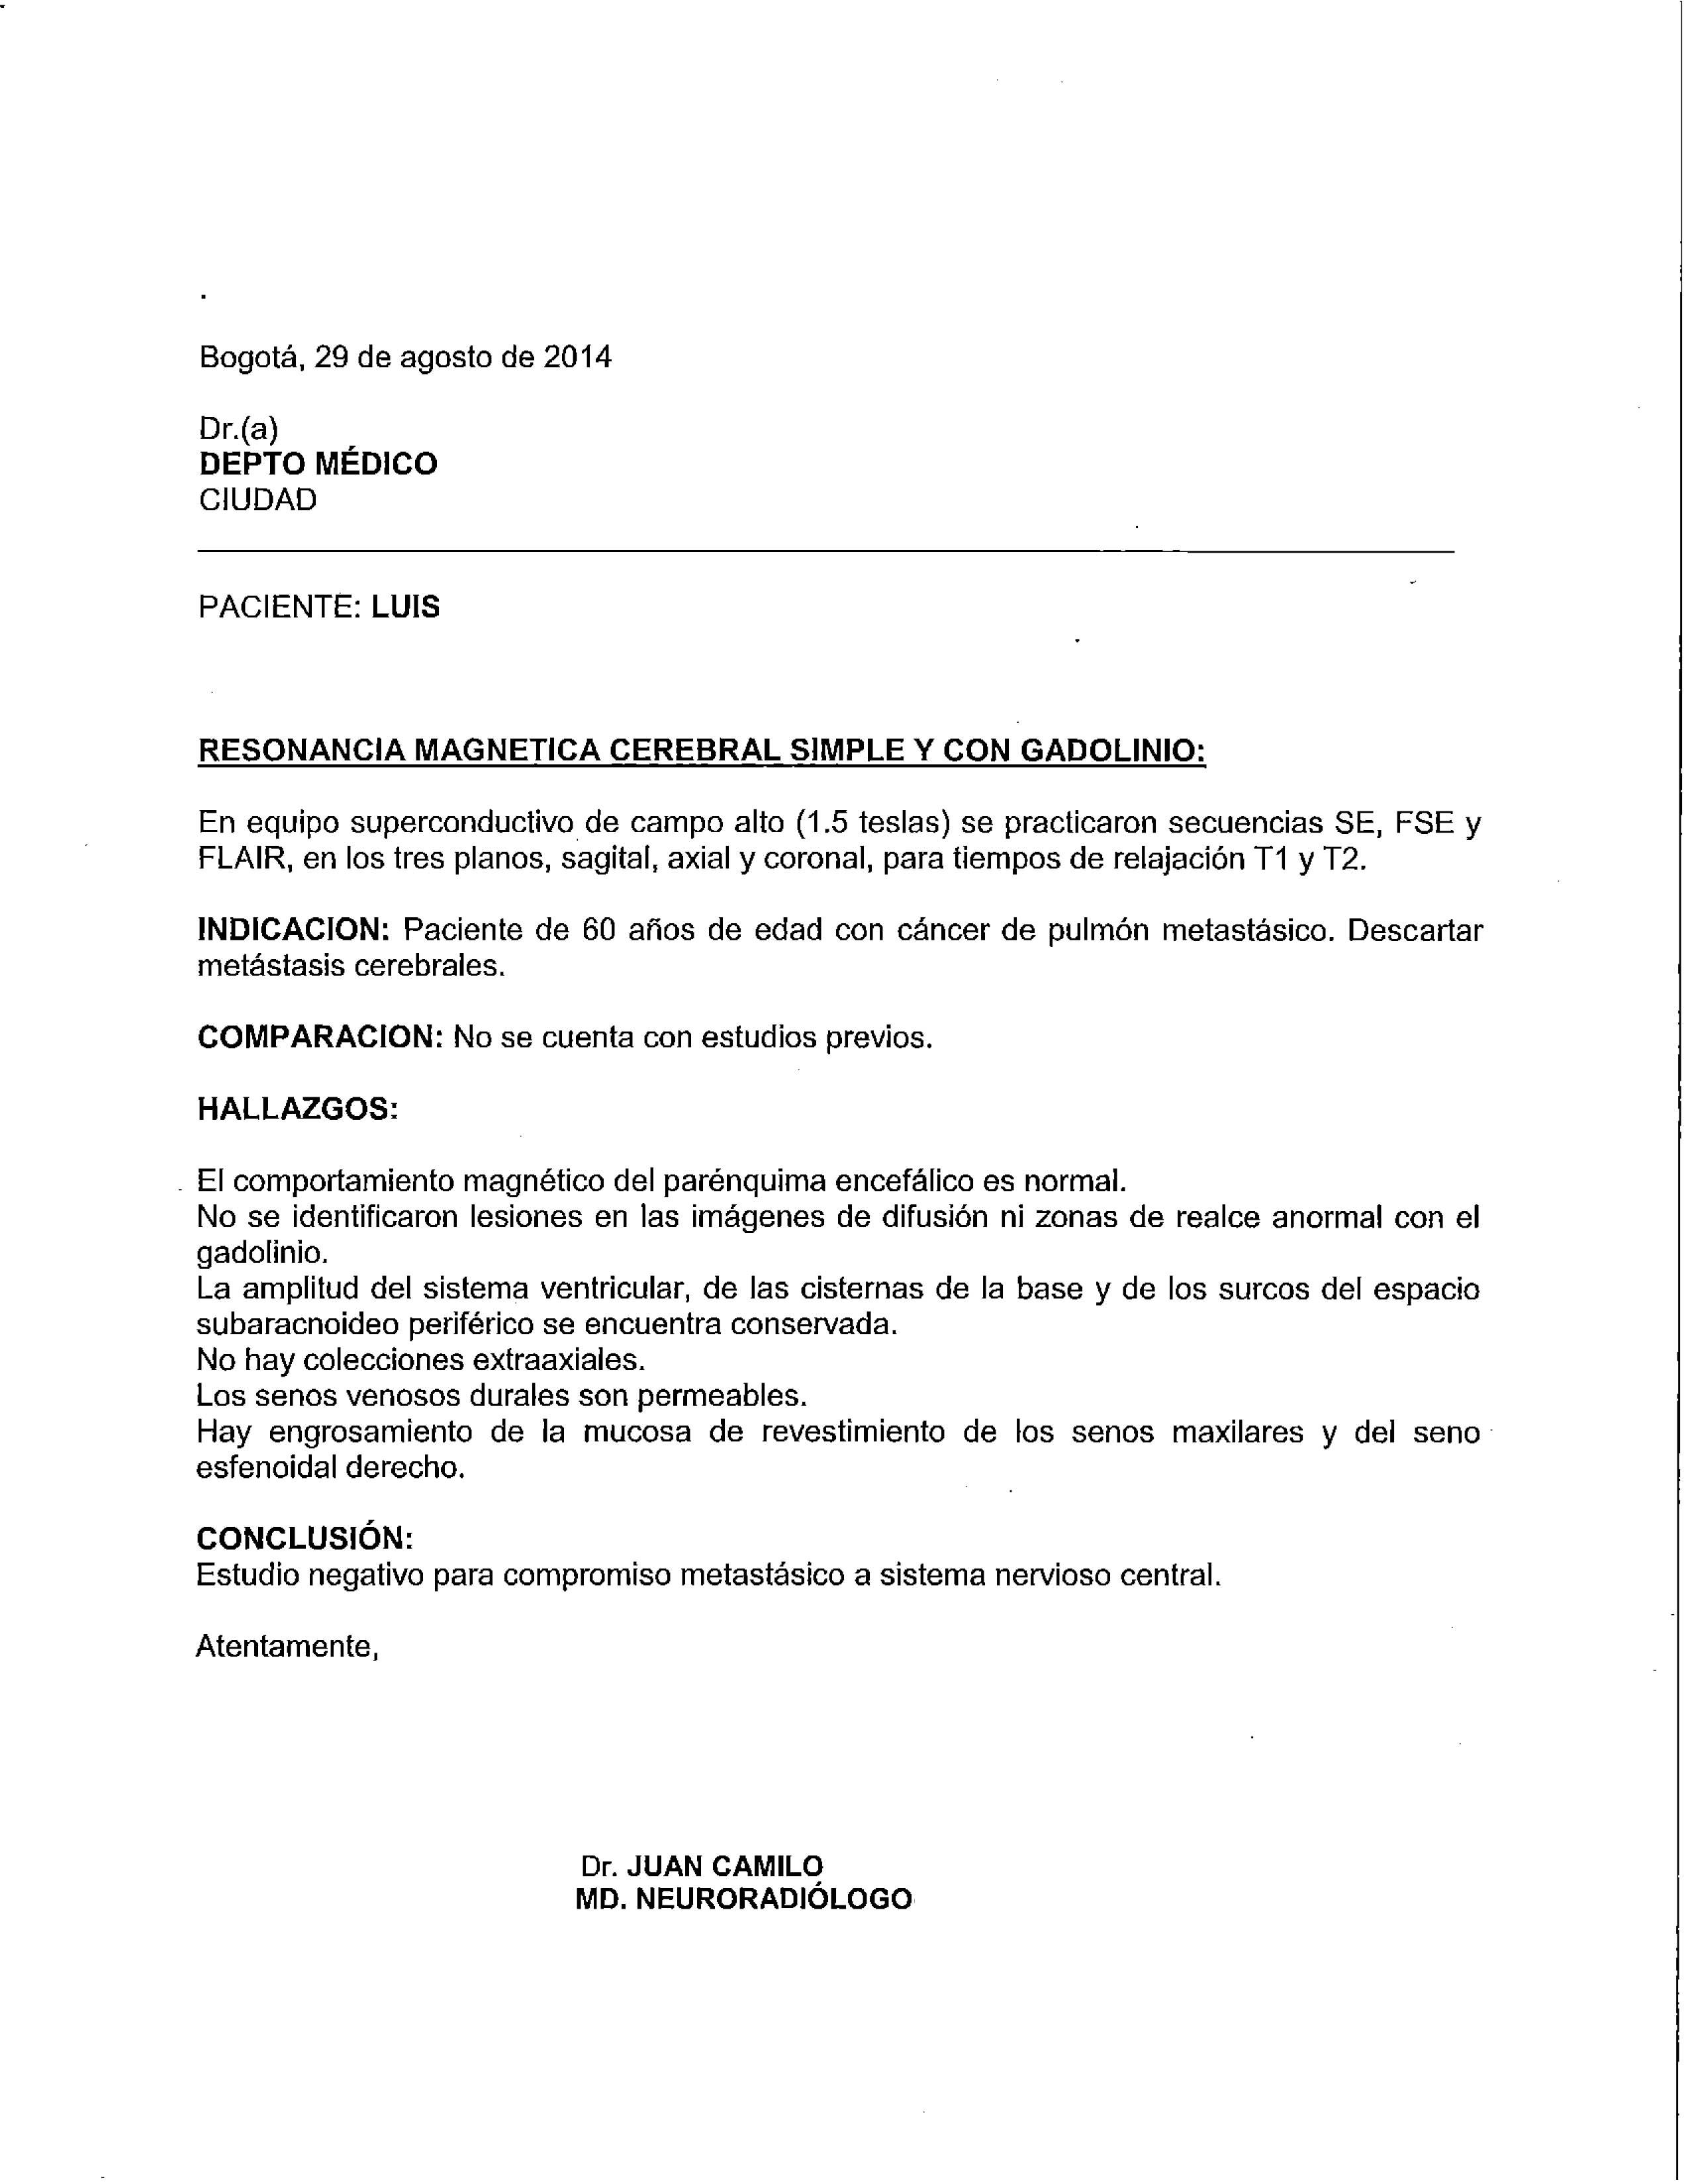 LifEscozul® - Luis 6 - Cáncer de Pulmon